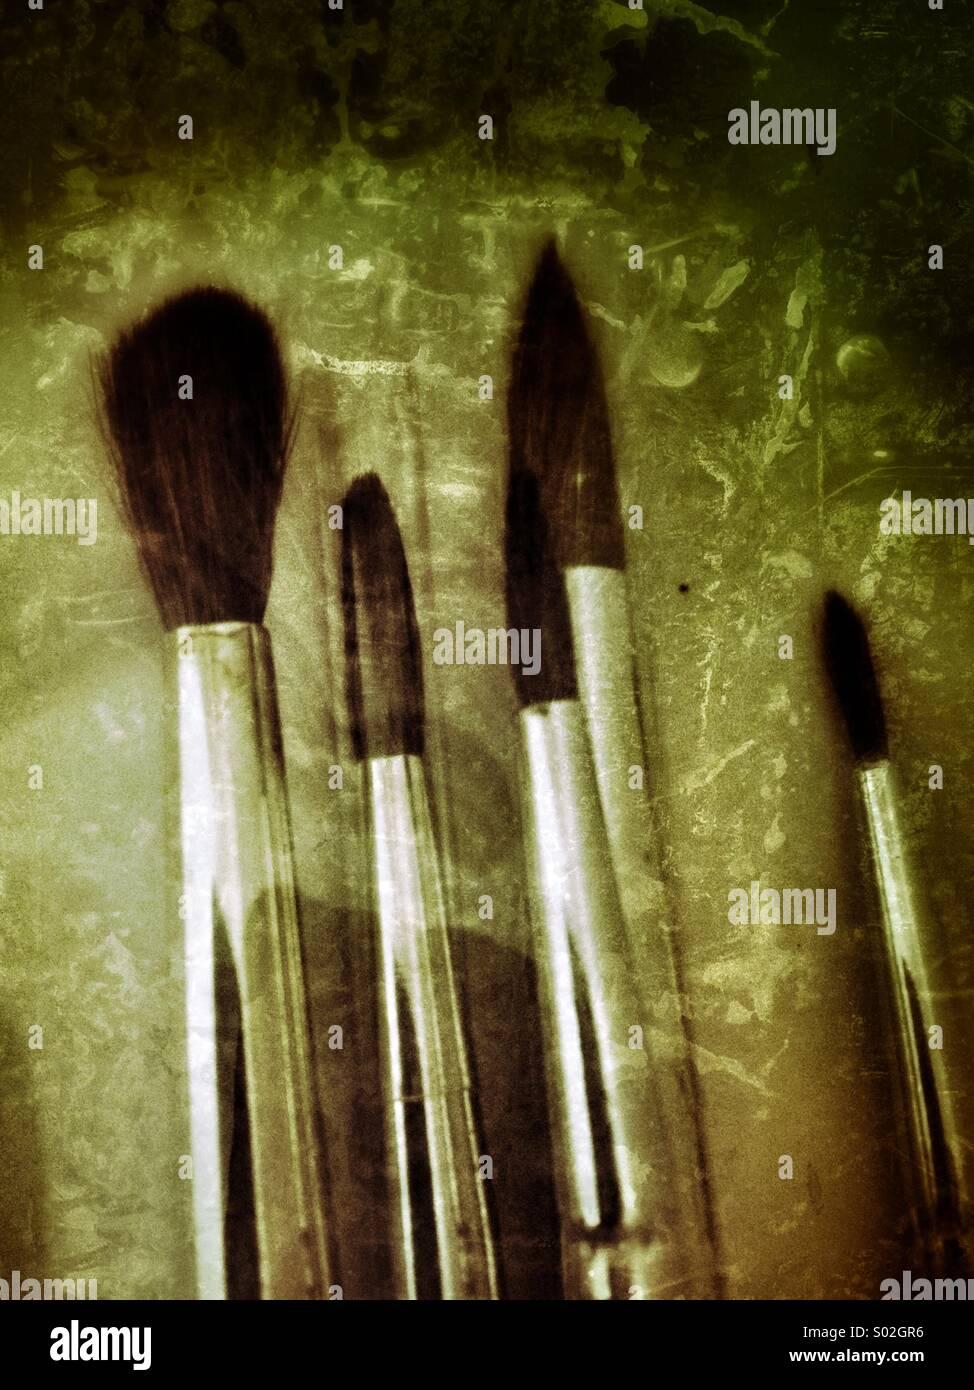 Artists Brushes - Stock Image